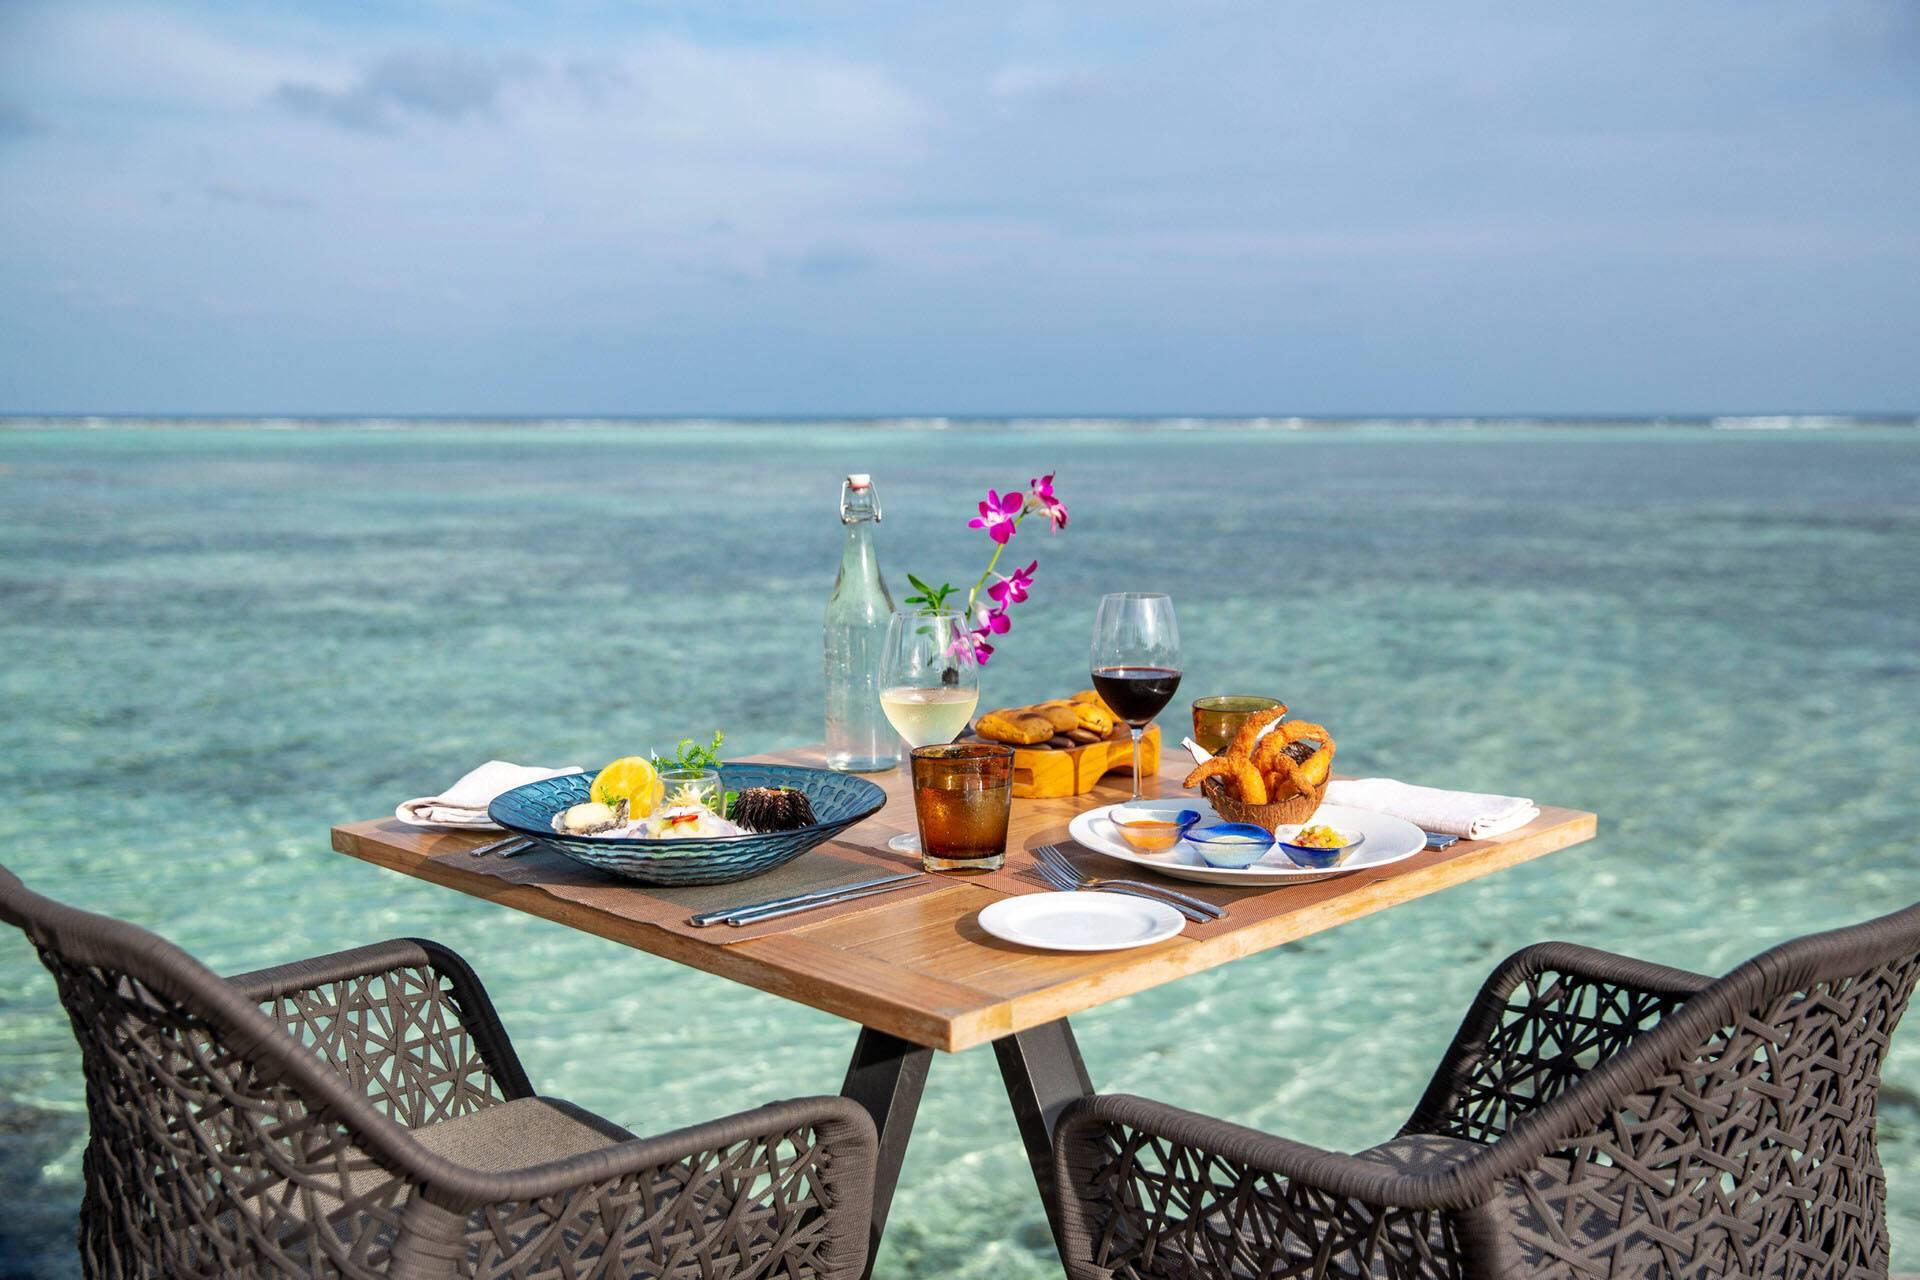 Four Seasons Kuda Huraa Maldives Petit Dejeuner